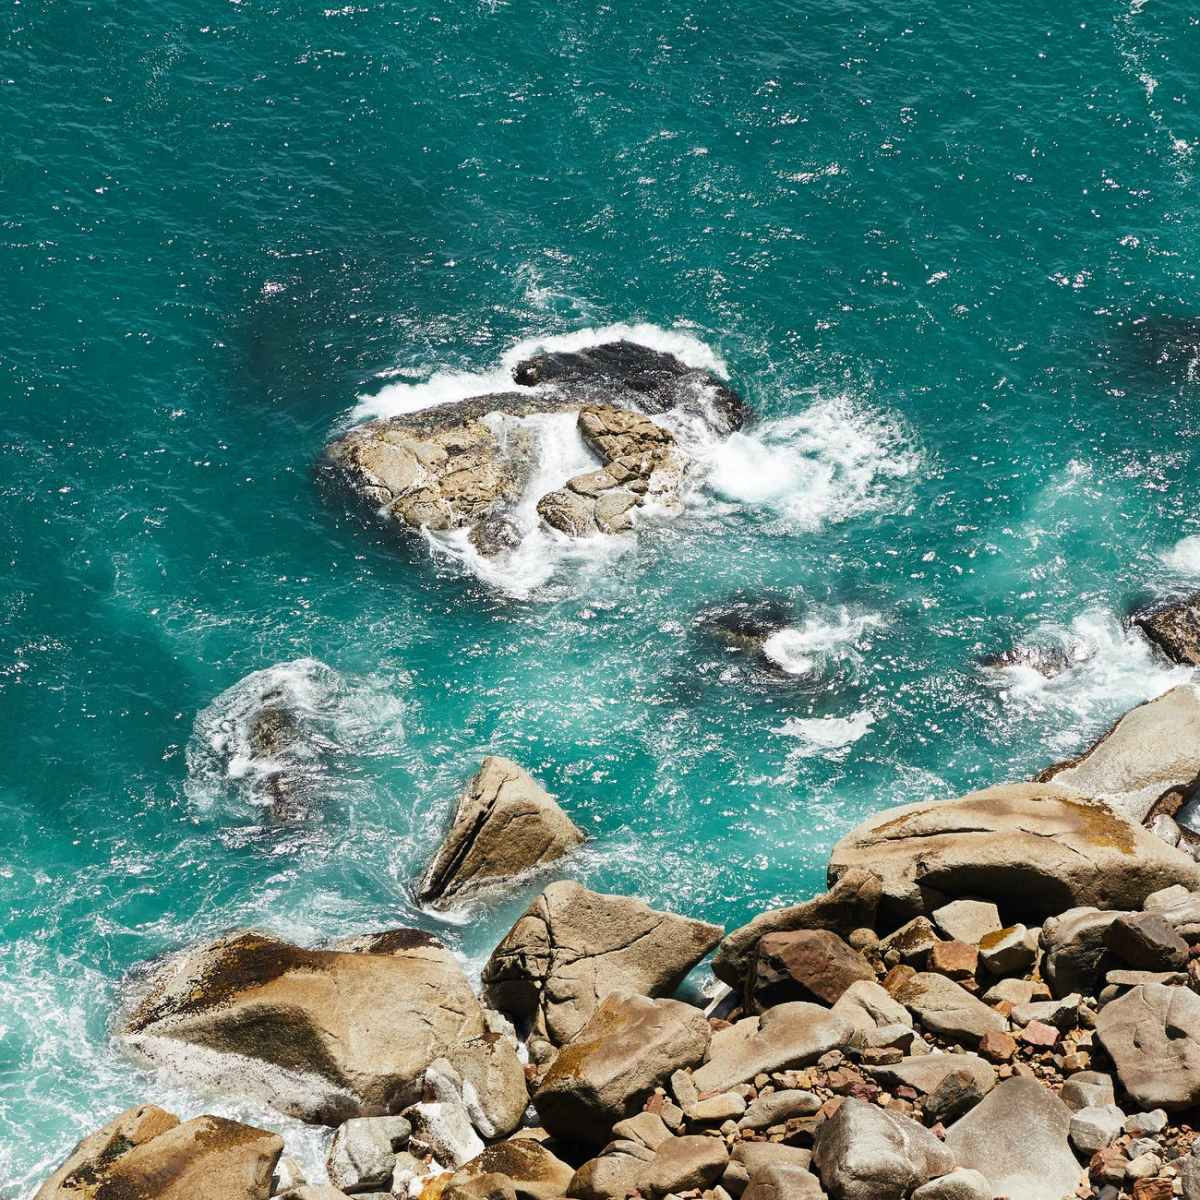 sea water splashing on stony coast